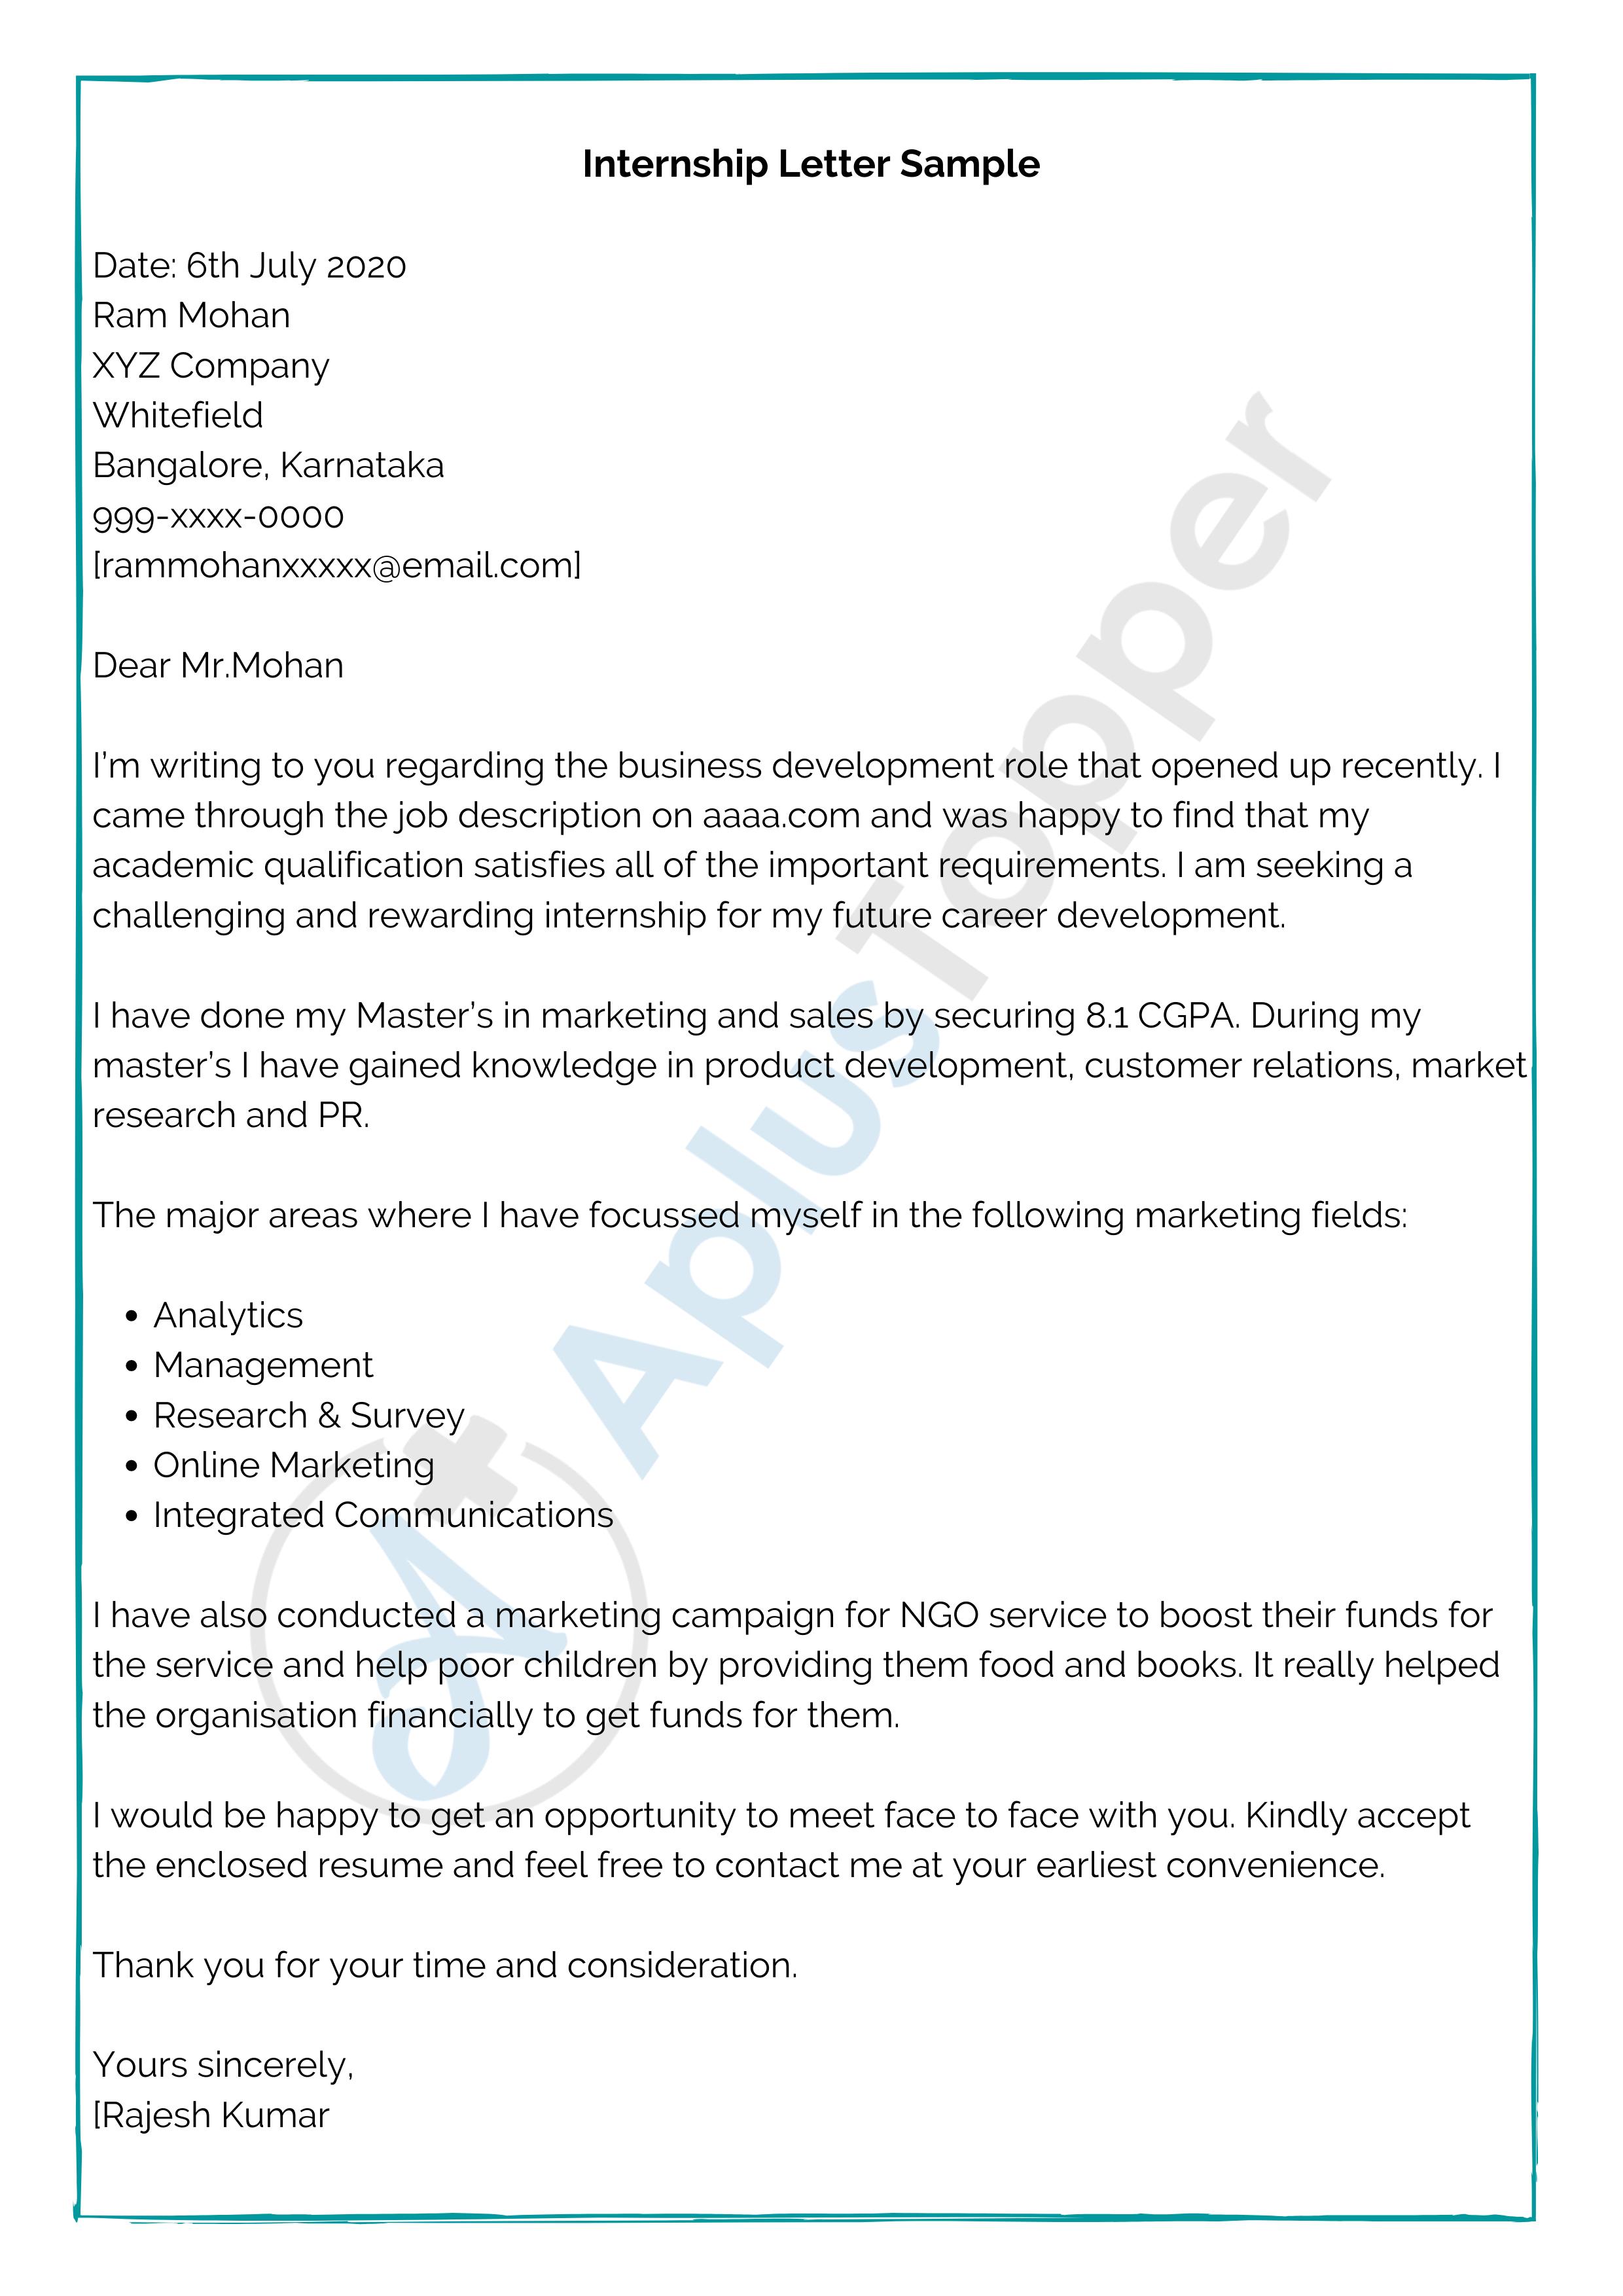 Internship Letter Samples